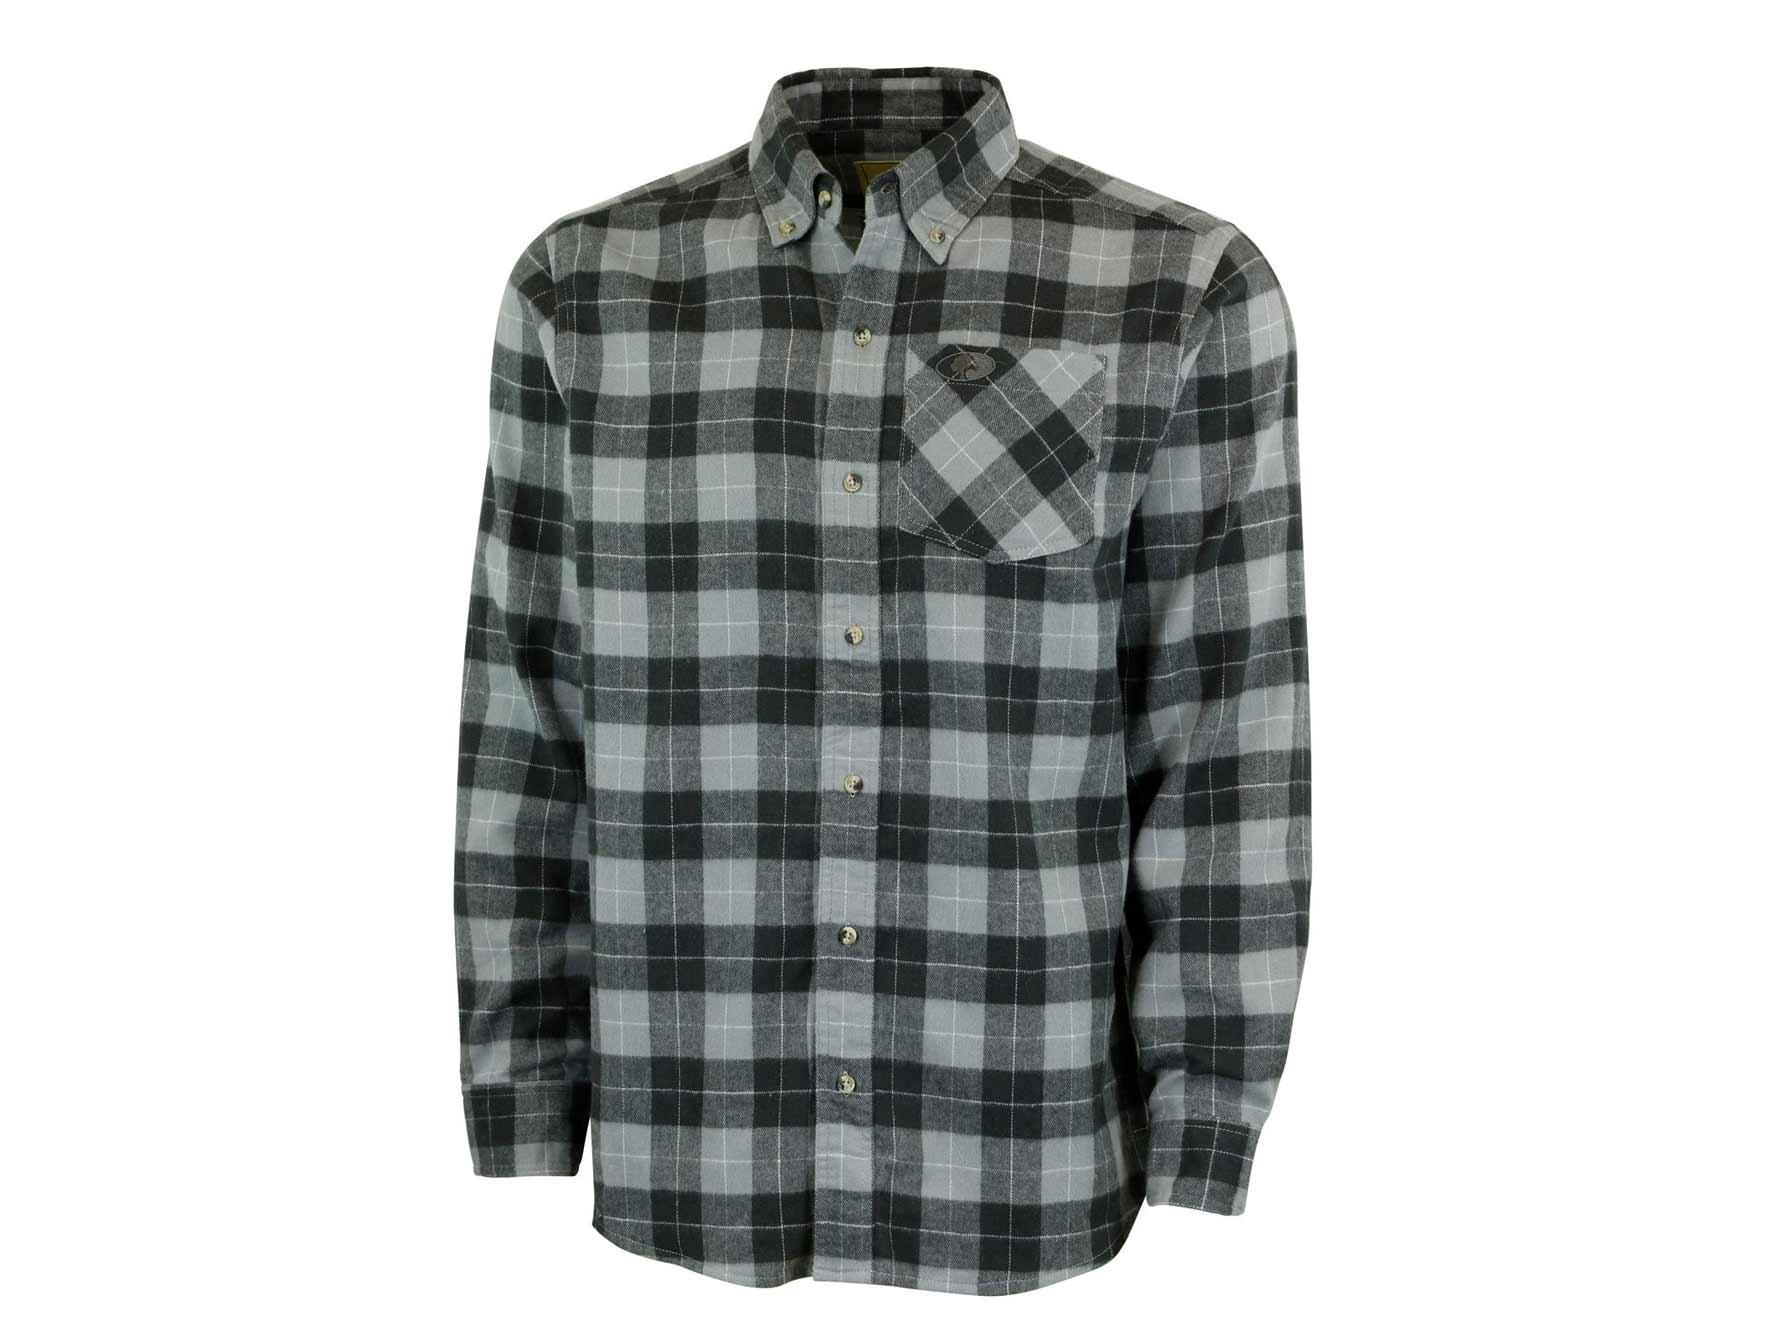 Grey and black plaid shirt